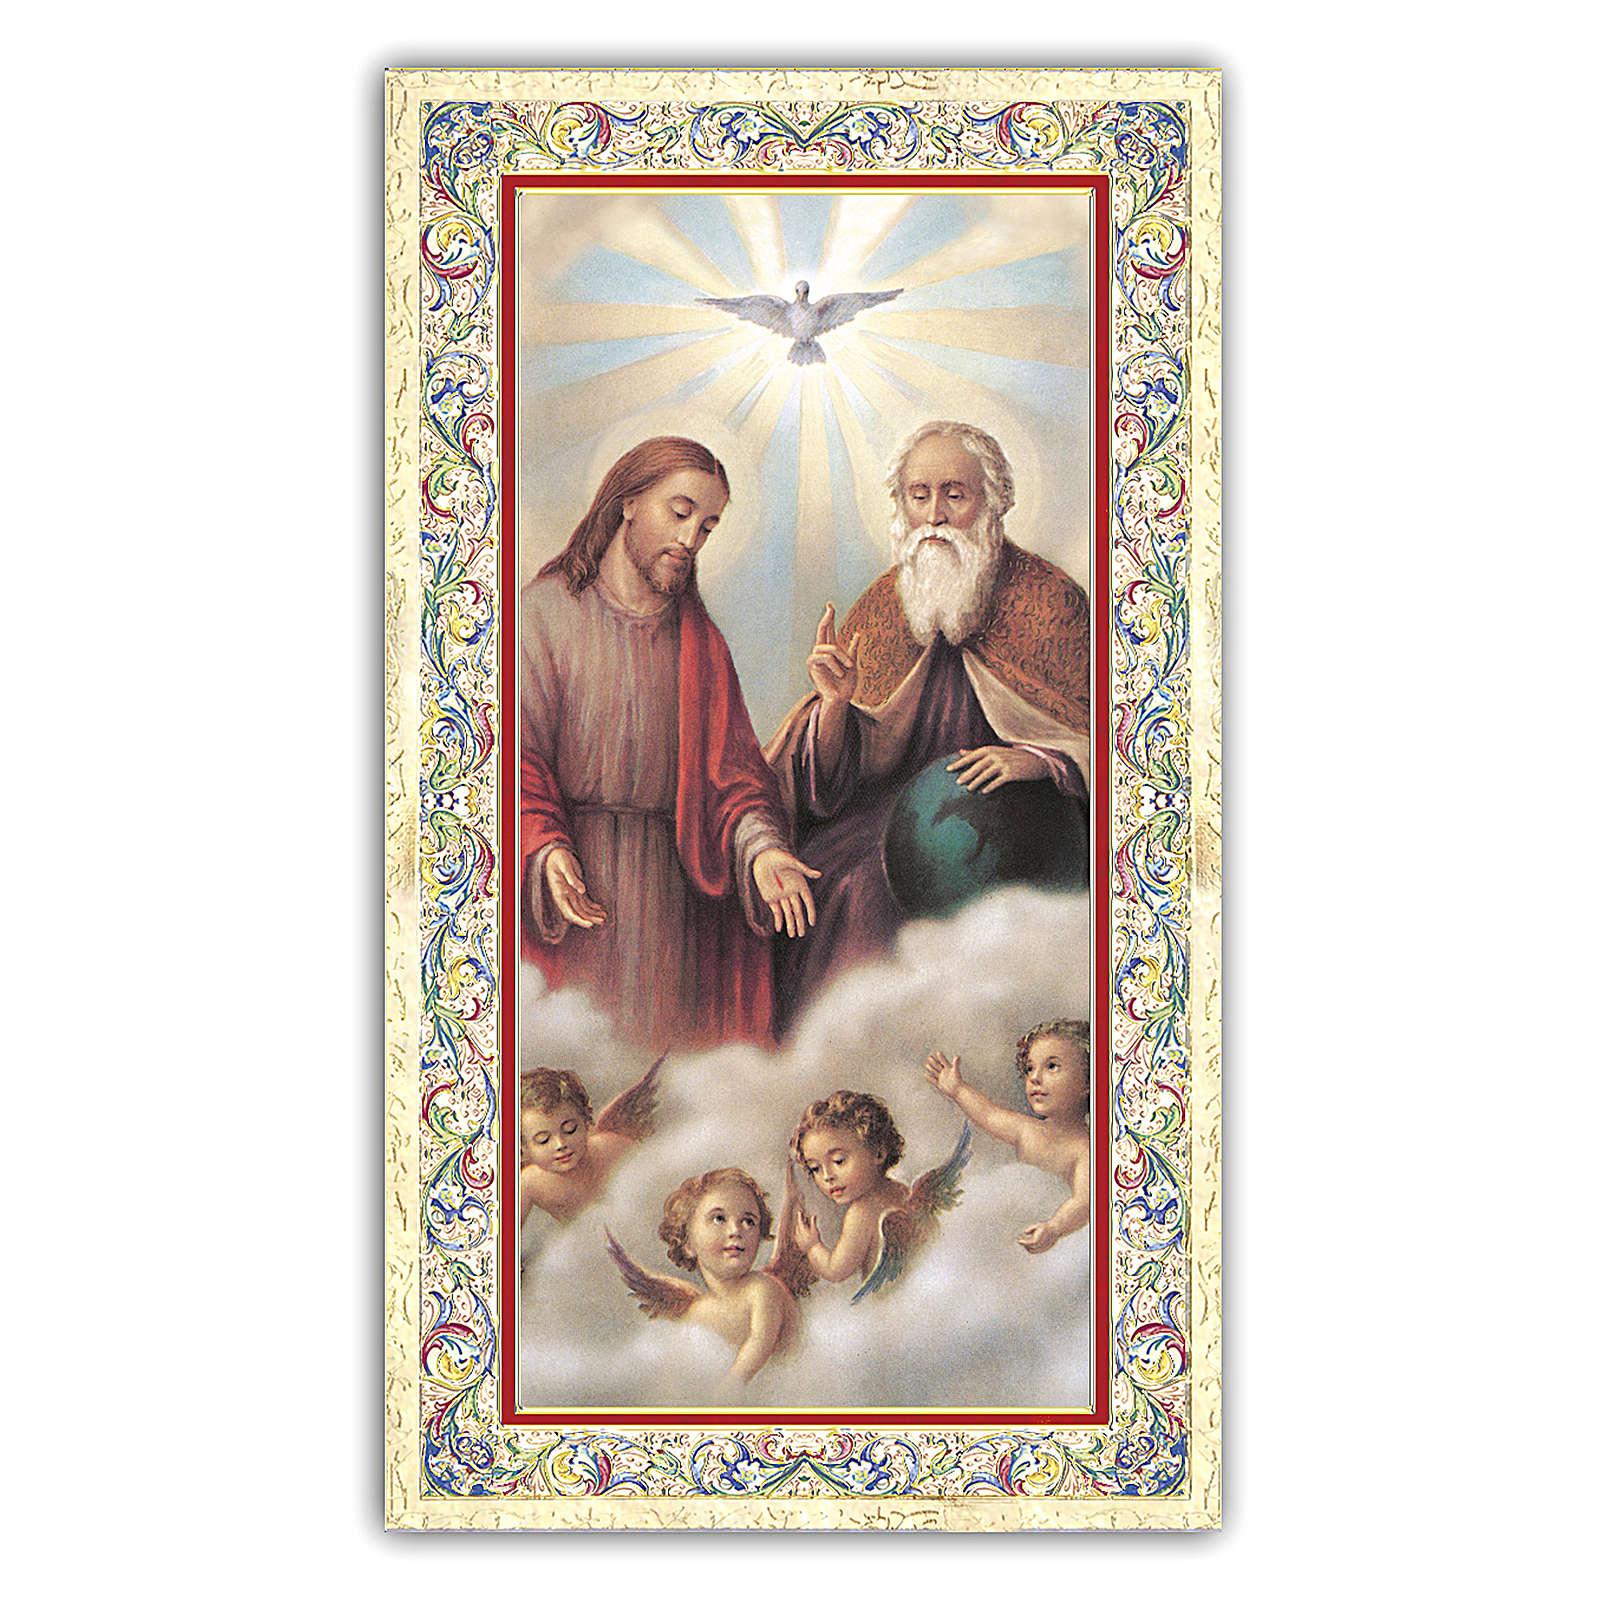 Estampa religiosa Santísima Trinidad 10x5 cm ITA 4